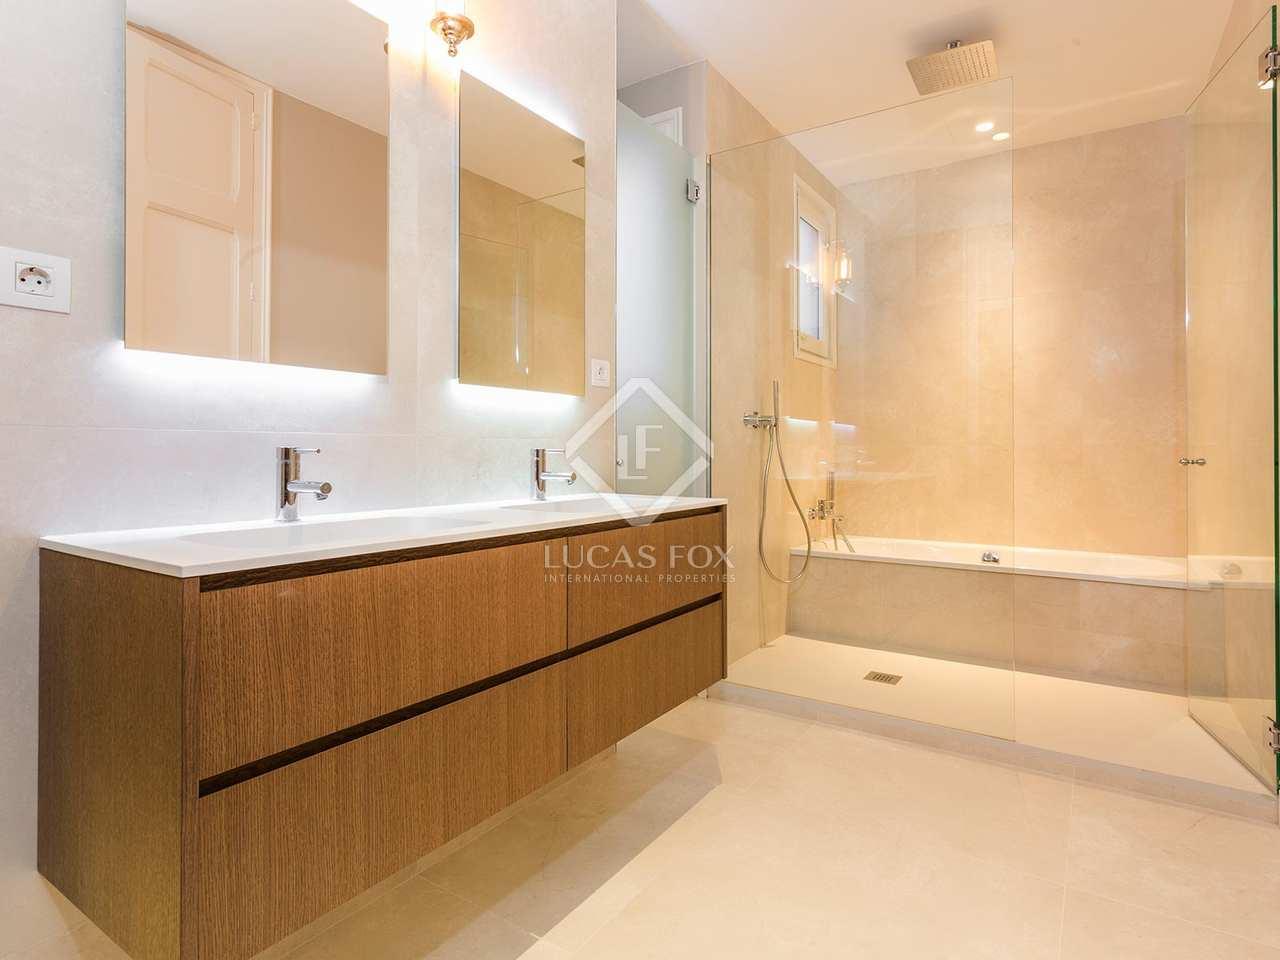 2 Bedroom 2 Bathroom Apartment For Sale In Eixample Left